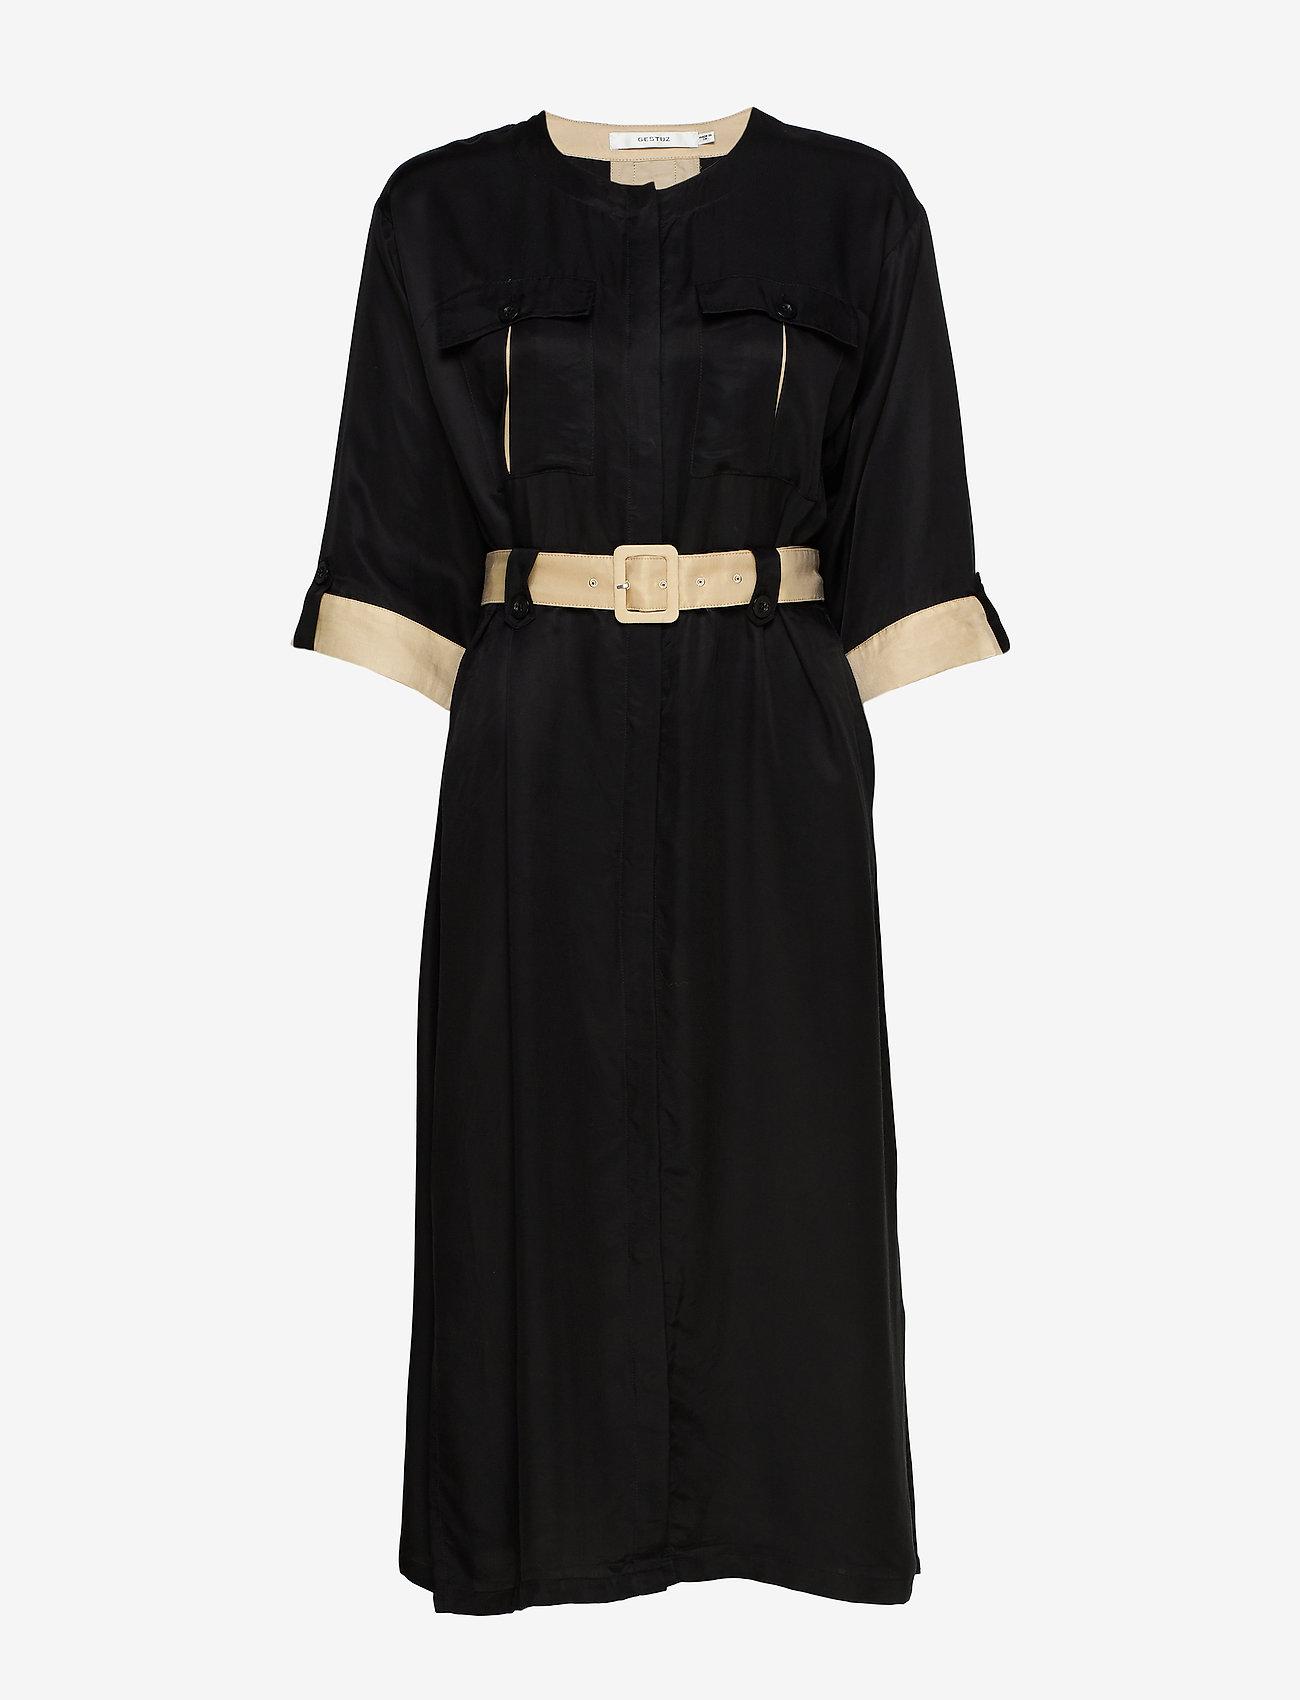 Lorahgz Dress Ms20 (Black) - Gestuz c9B3ht